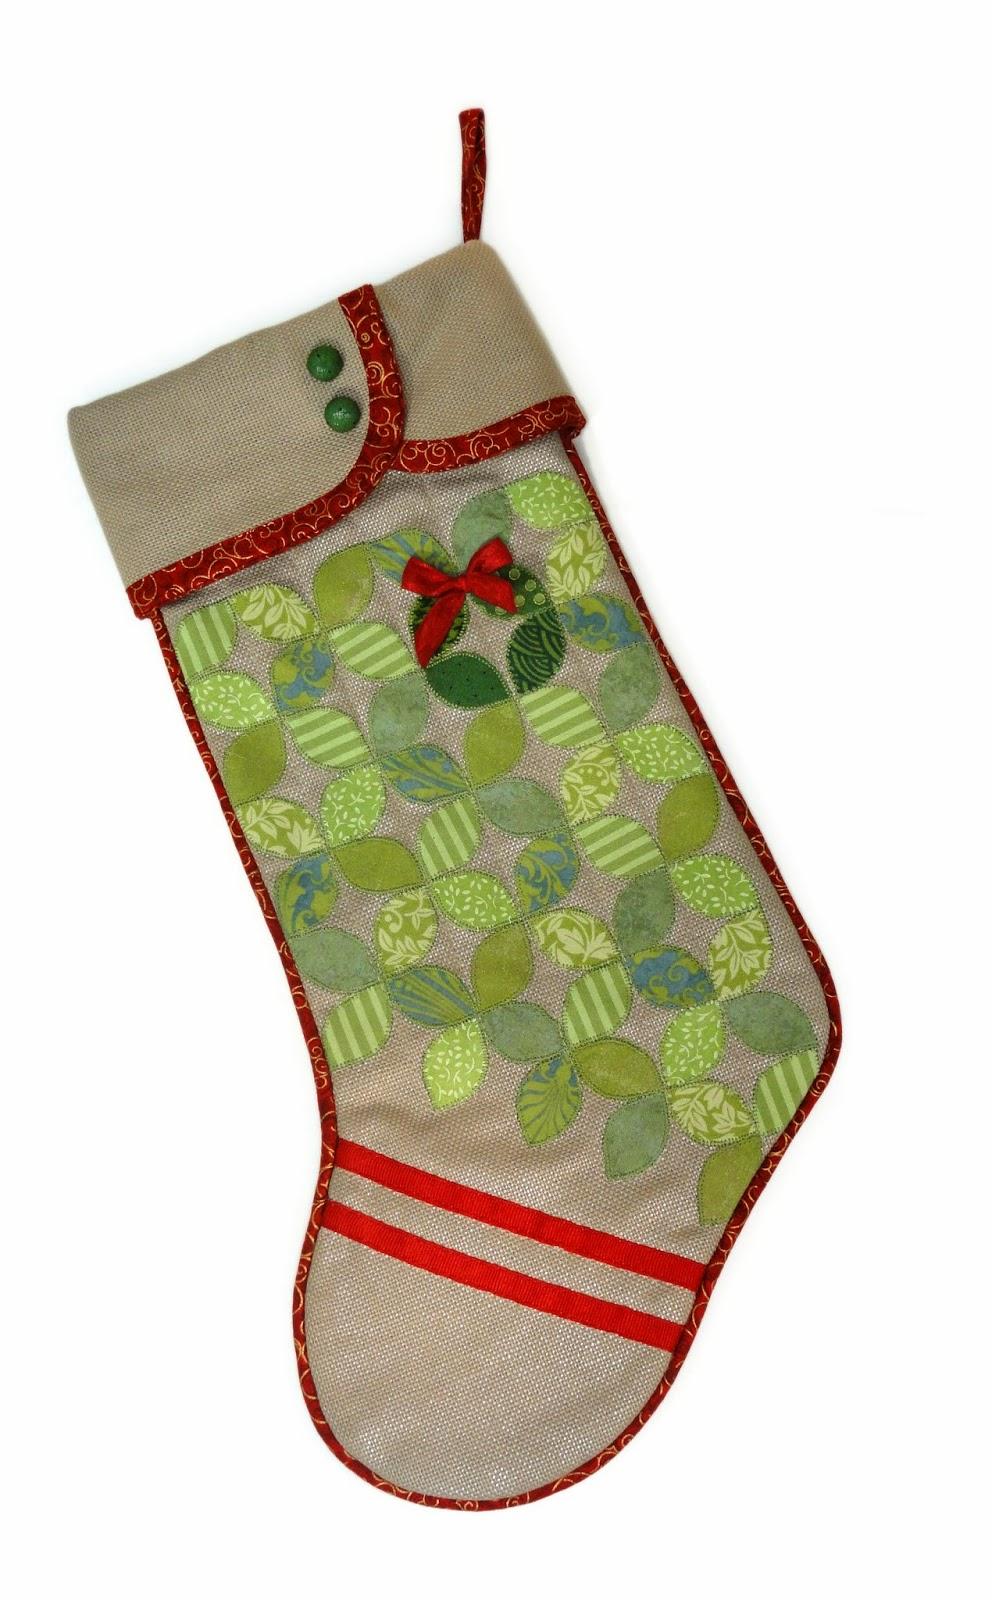 needles u0027n u0027 knowledge stocking inspirations with fabric cut shapes